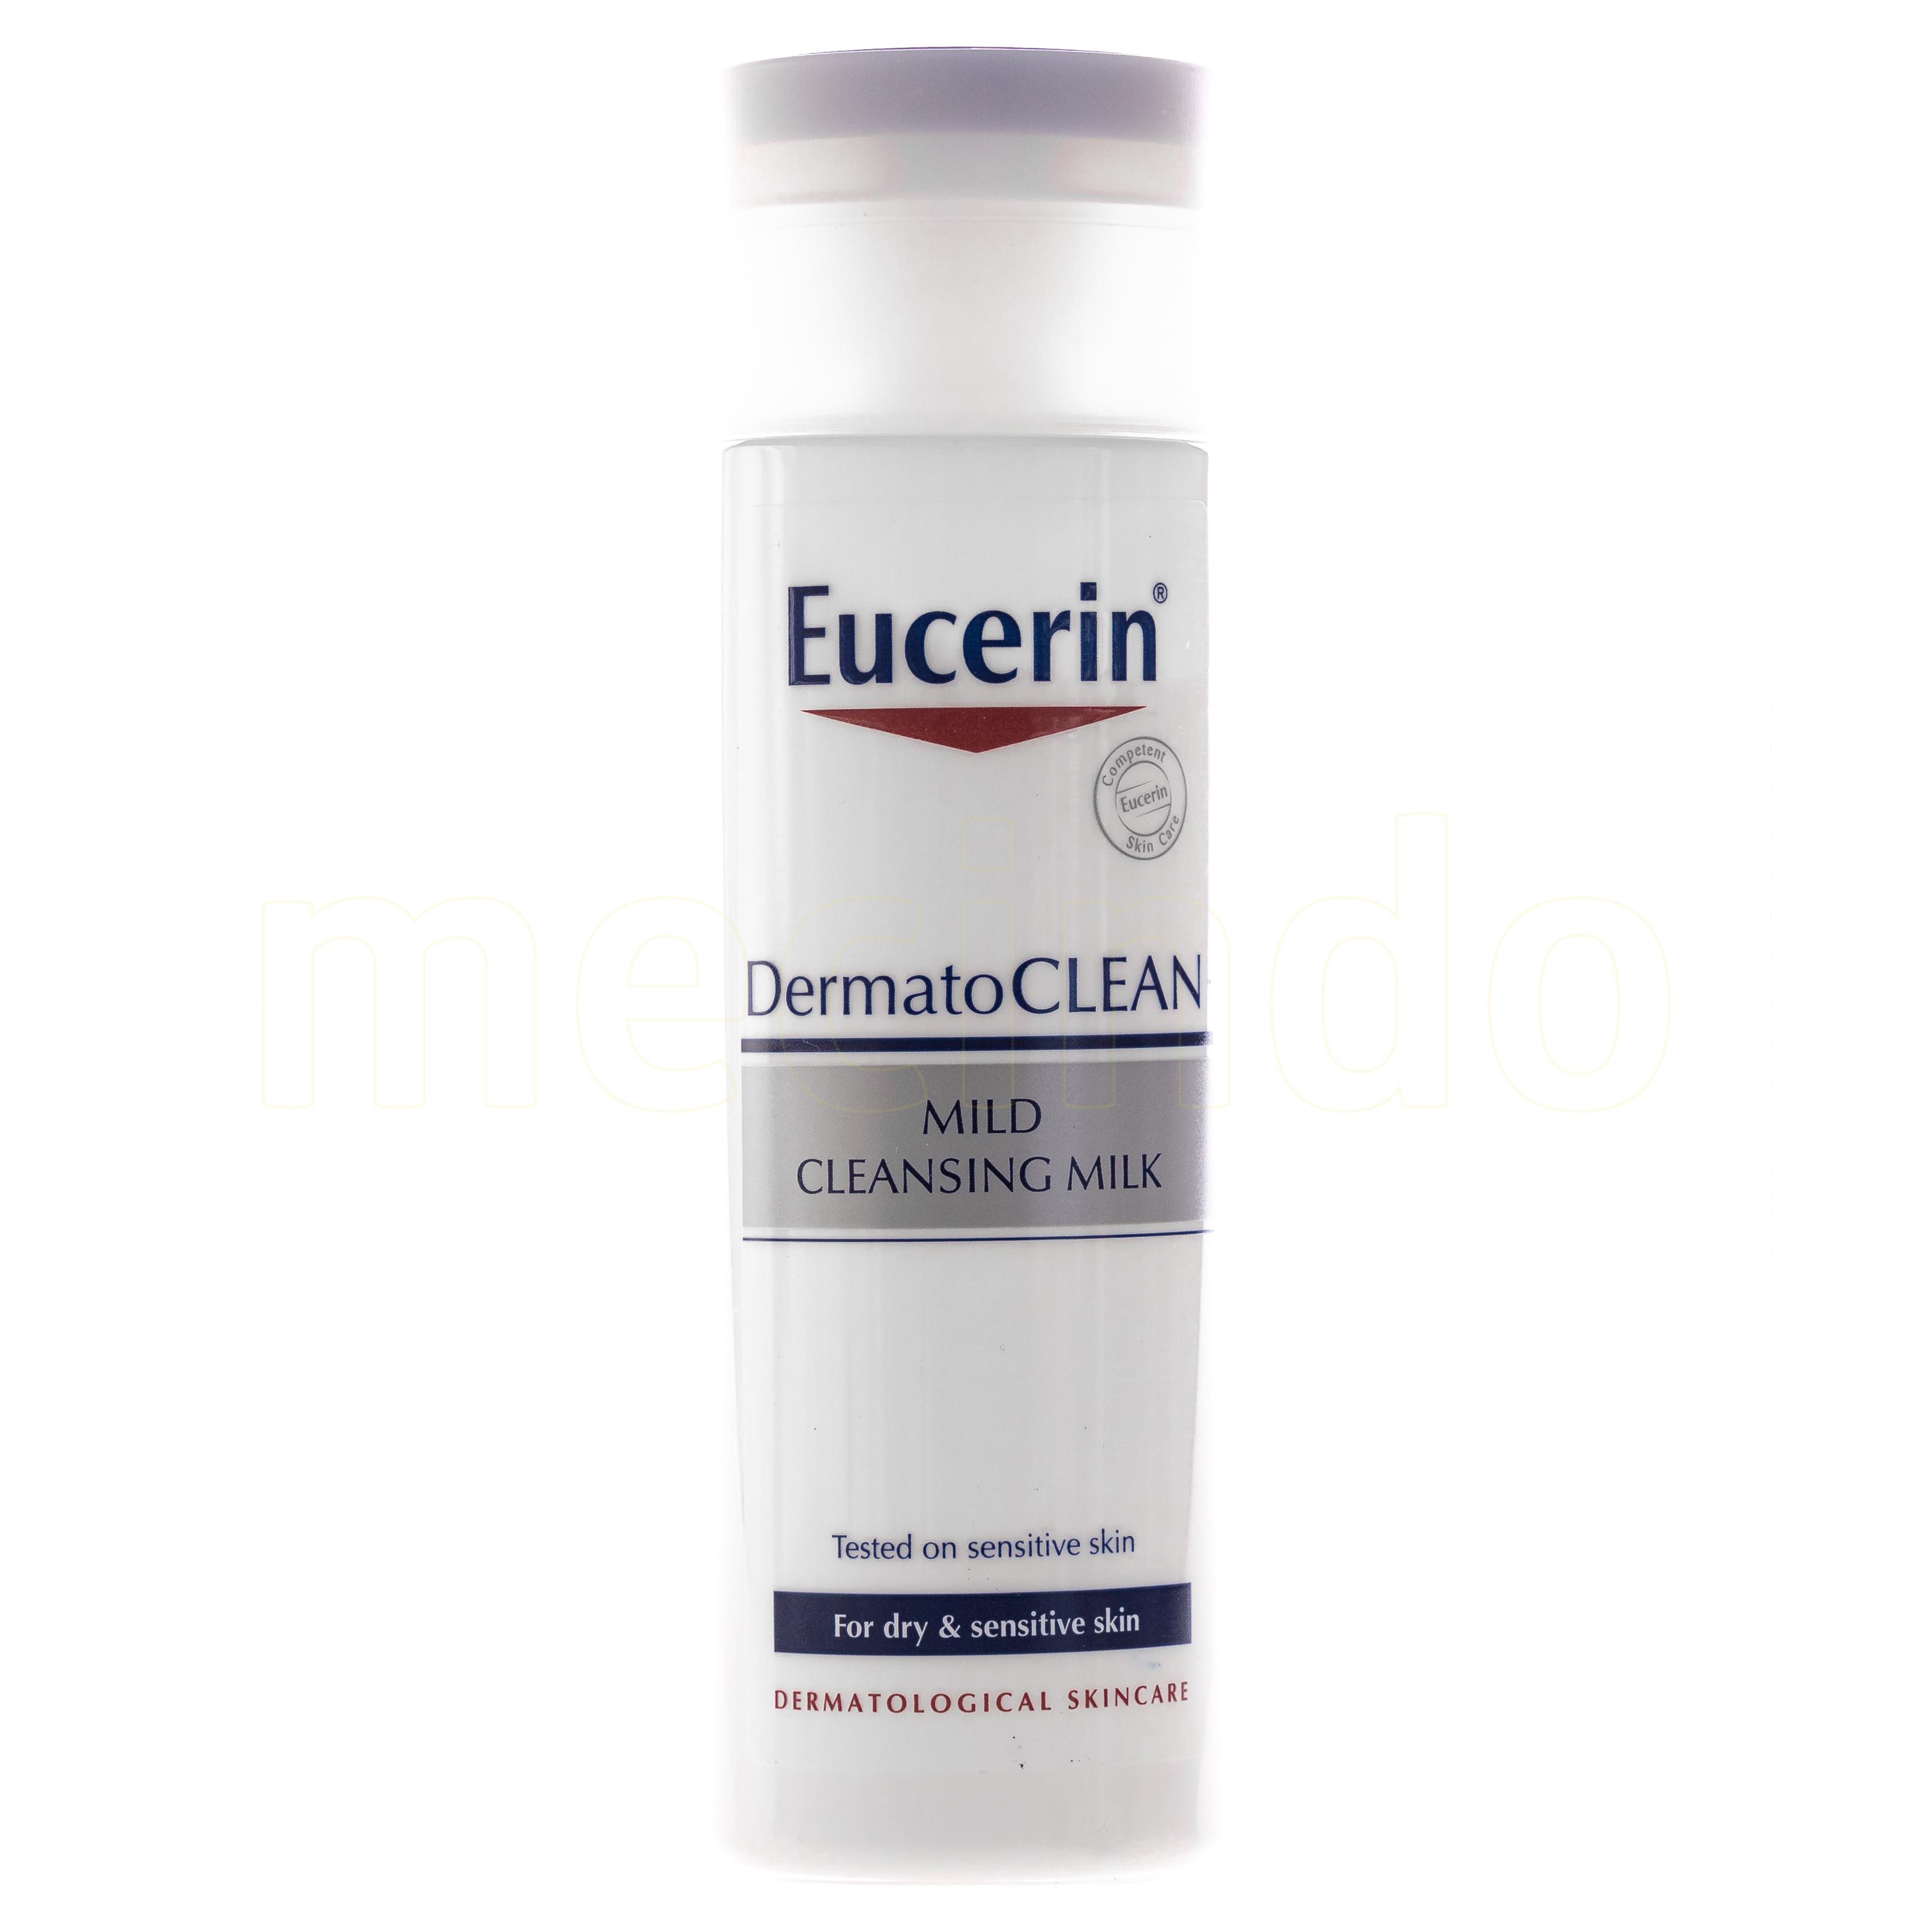 Eucerin Dermatoclean Cleansing Milk - 200 ml